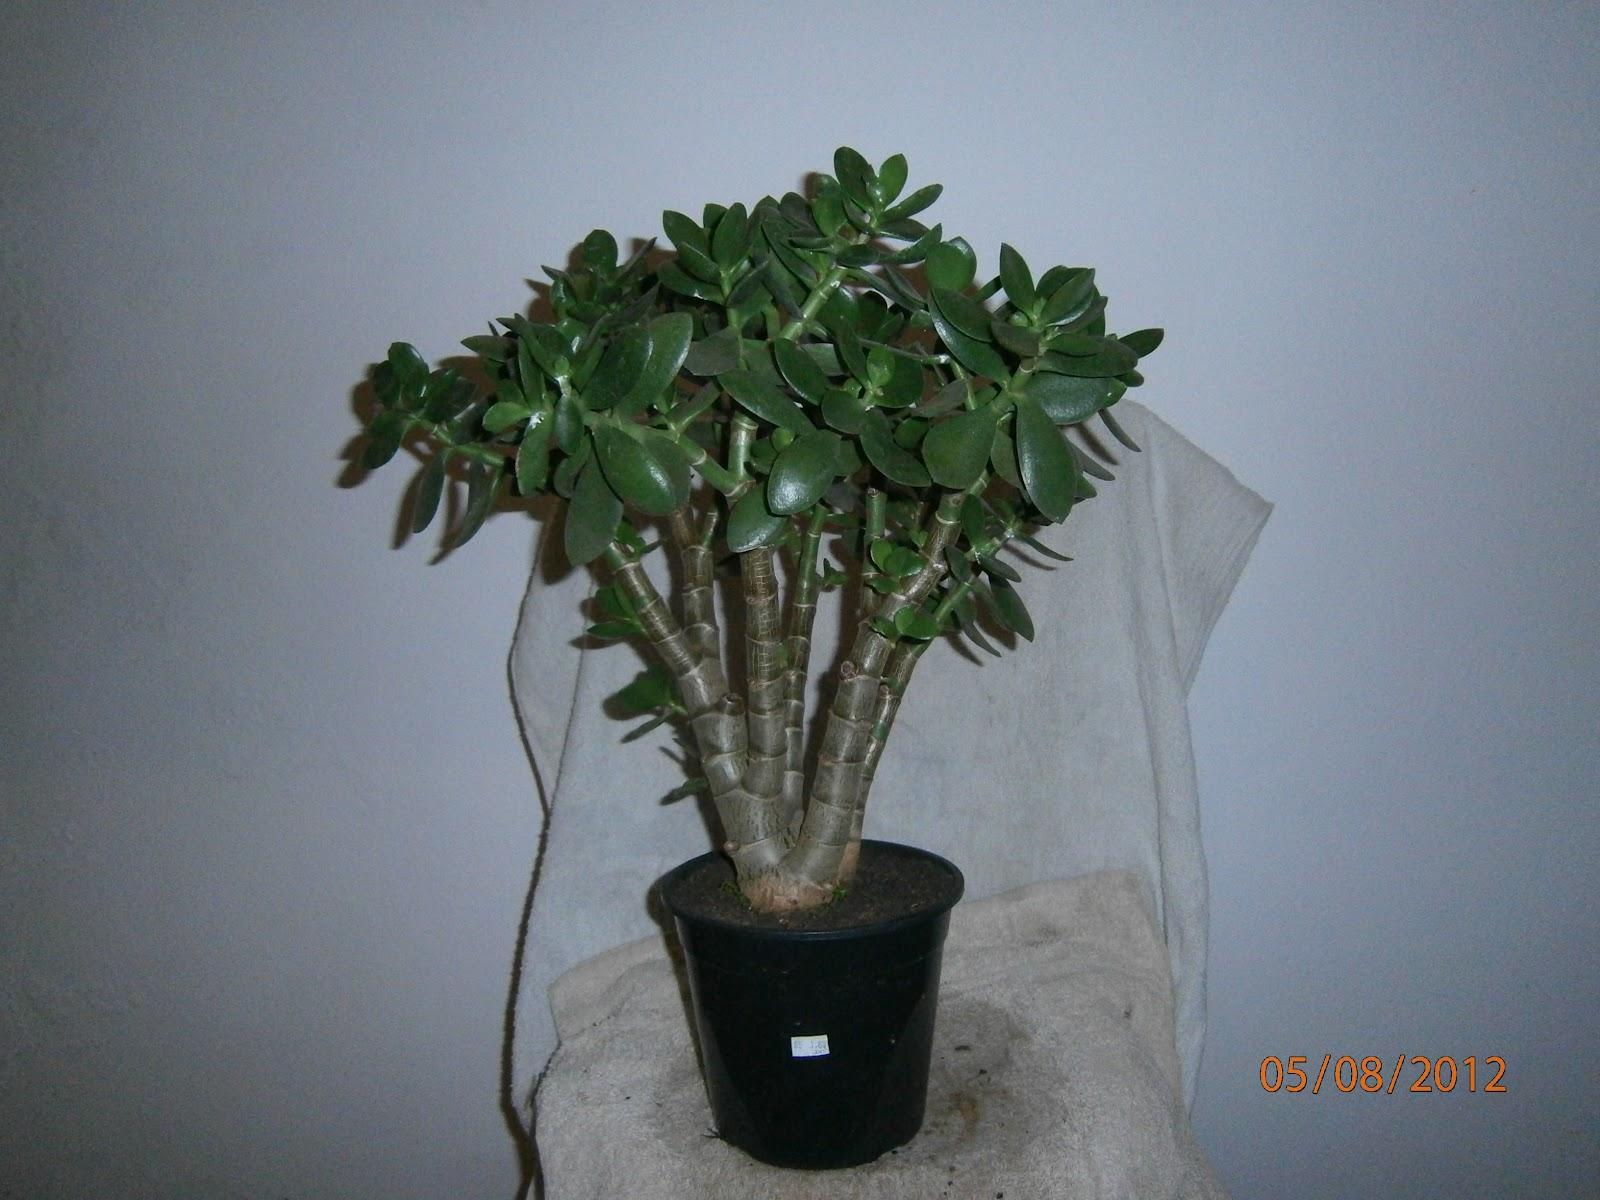 BONSAI FCIL RS PLANTA JADE Ou JADE PLANT Crassula Ovata